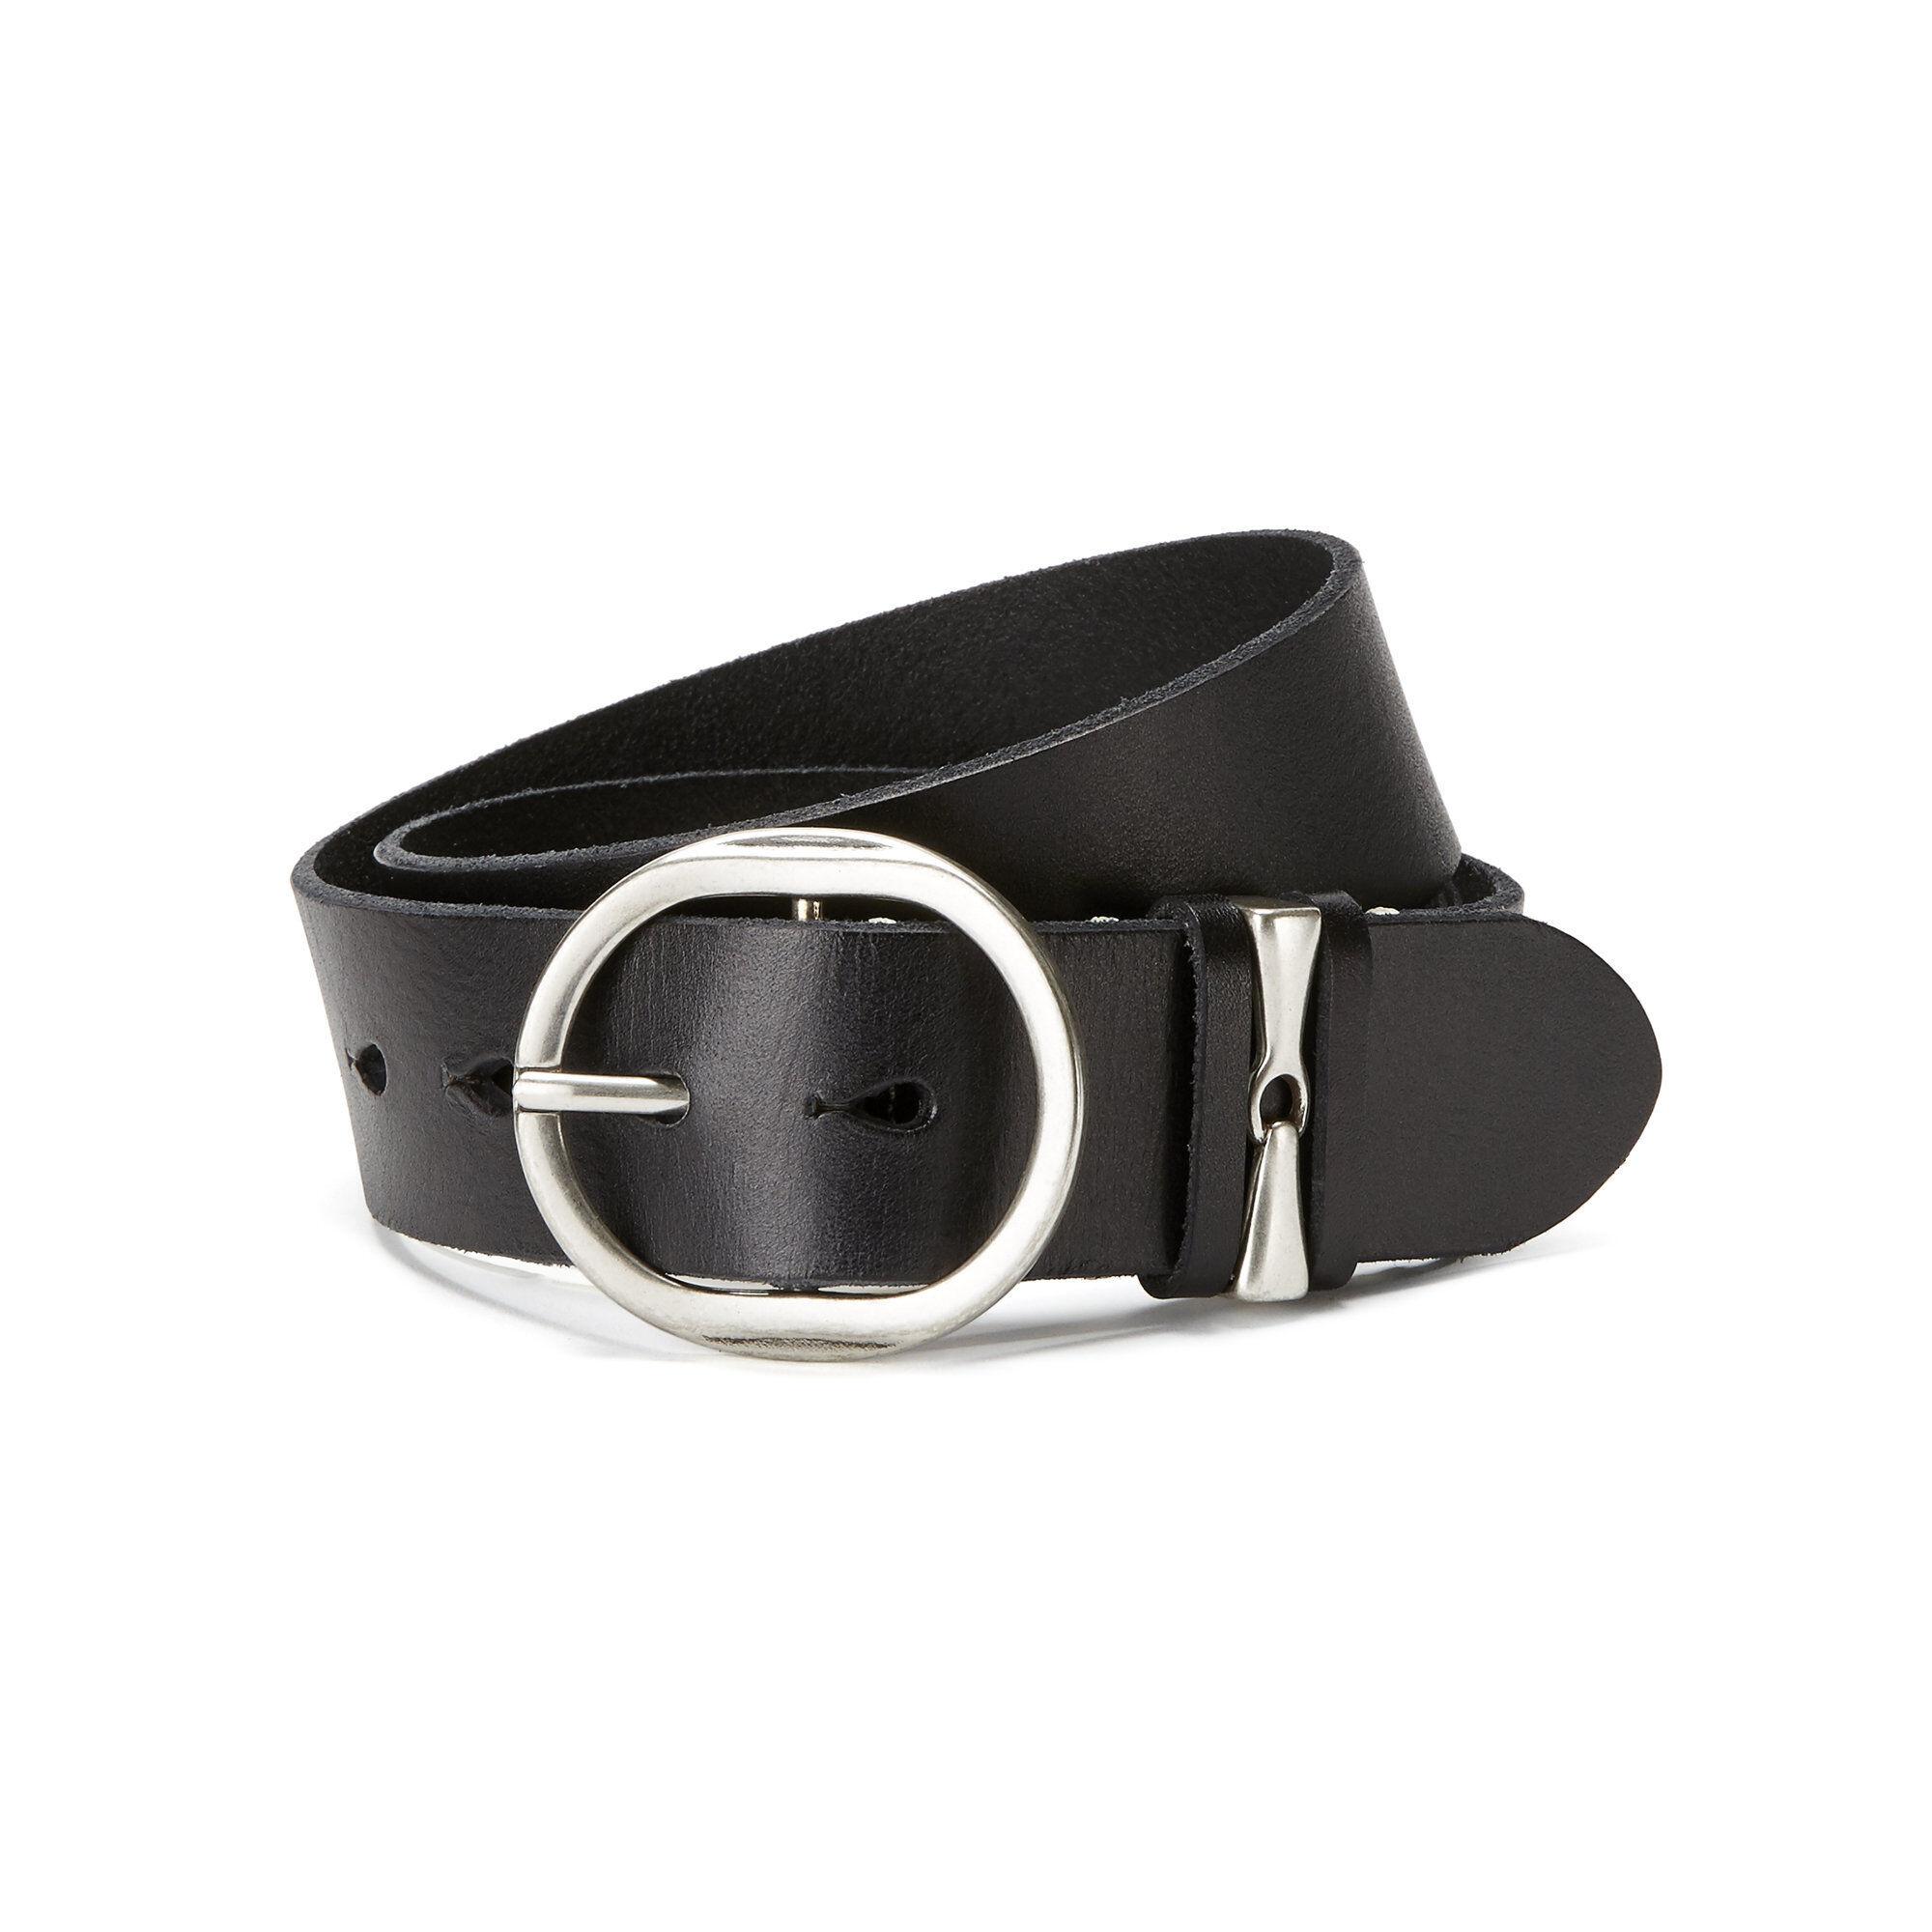 Ariat Snaffle Belt in Black Leather, Medium by Ariat